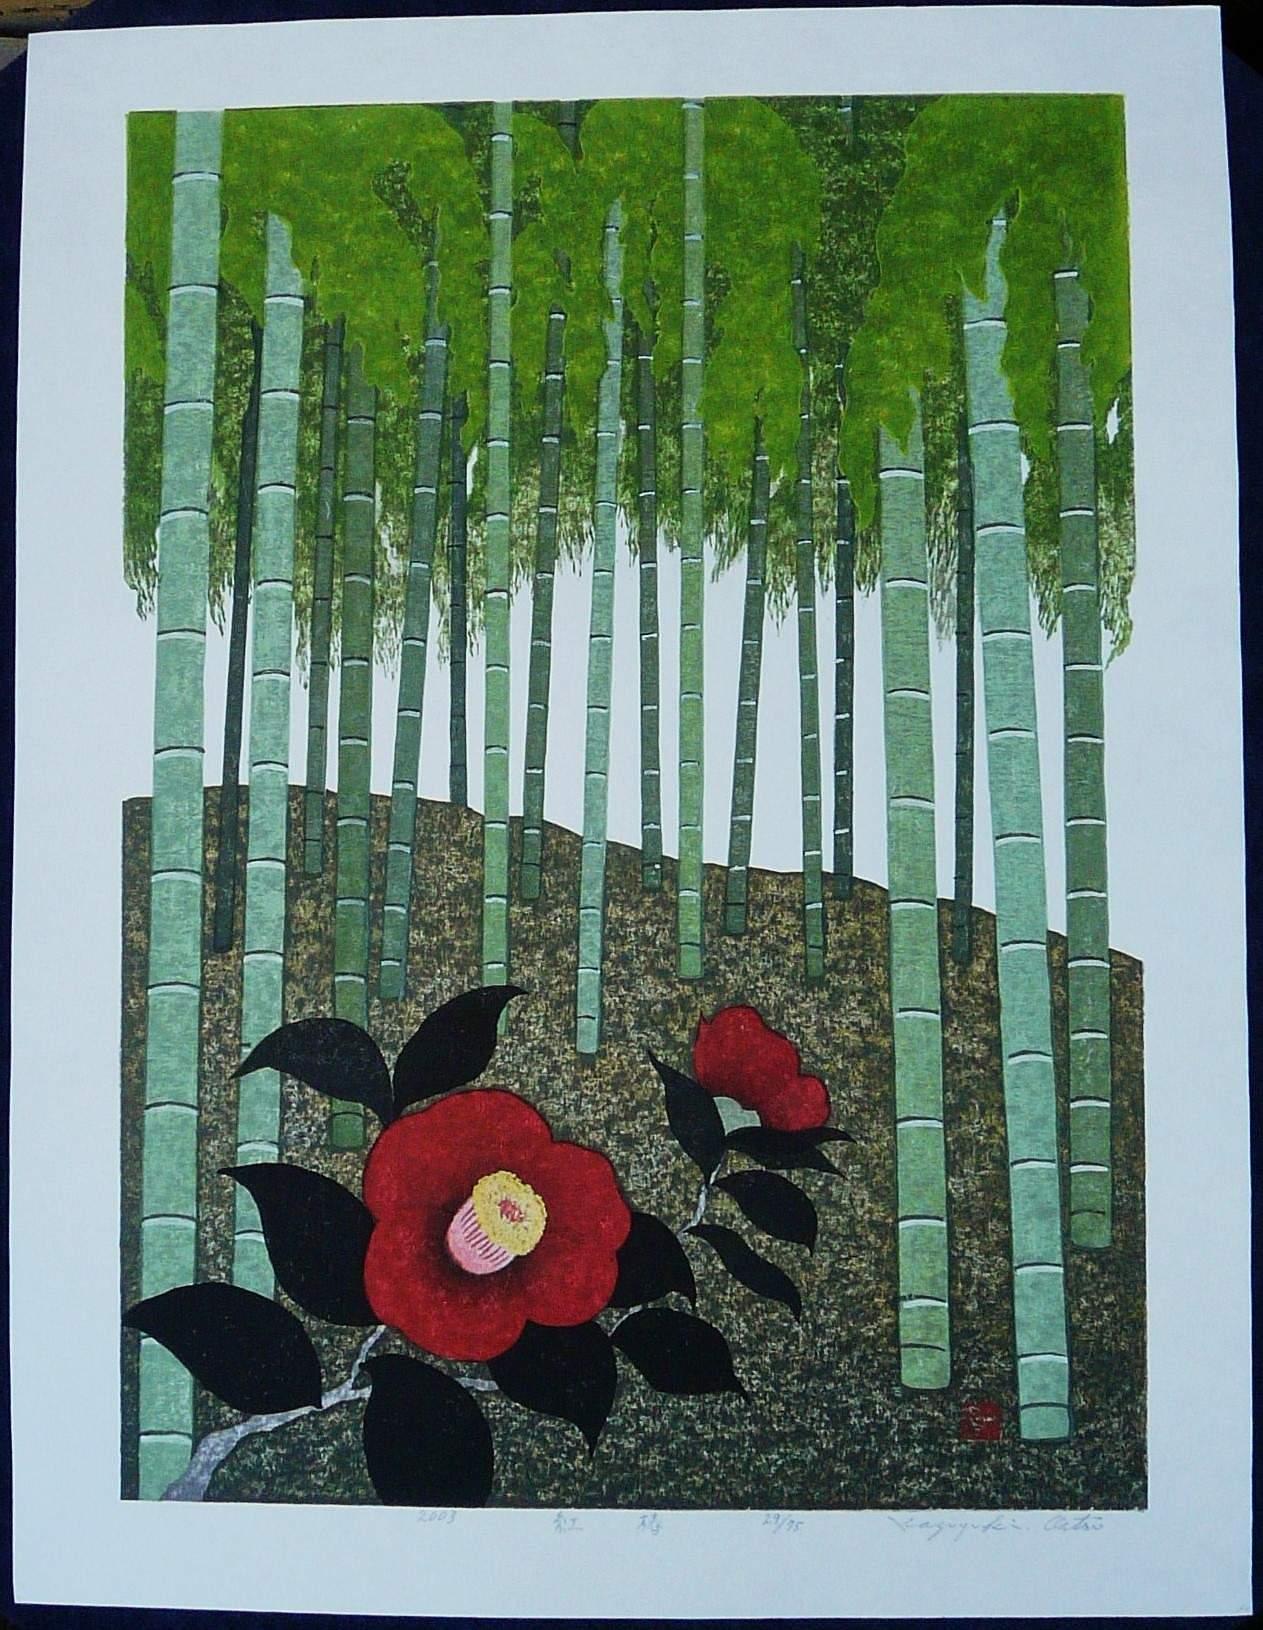 Katzuyuki Ohtsu: #P3813 RED CAMELLIA and BAMBOO